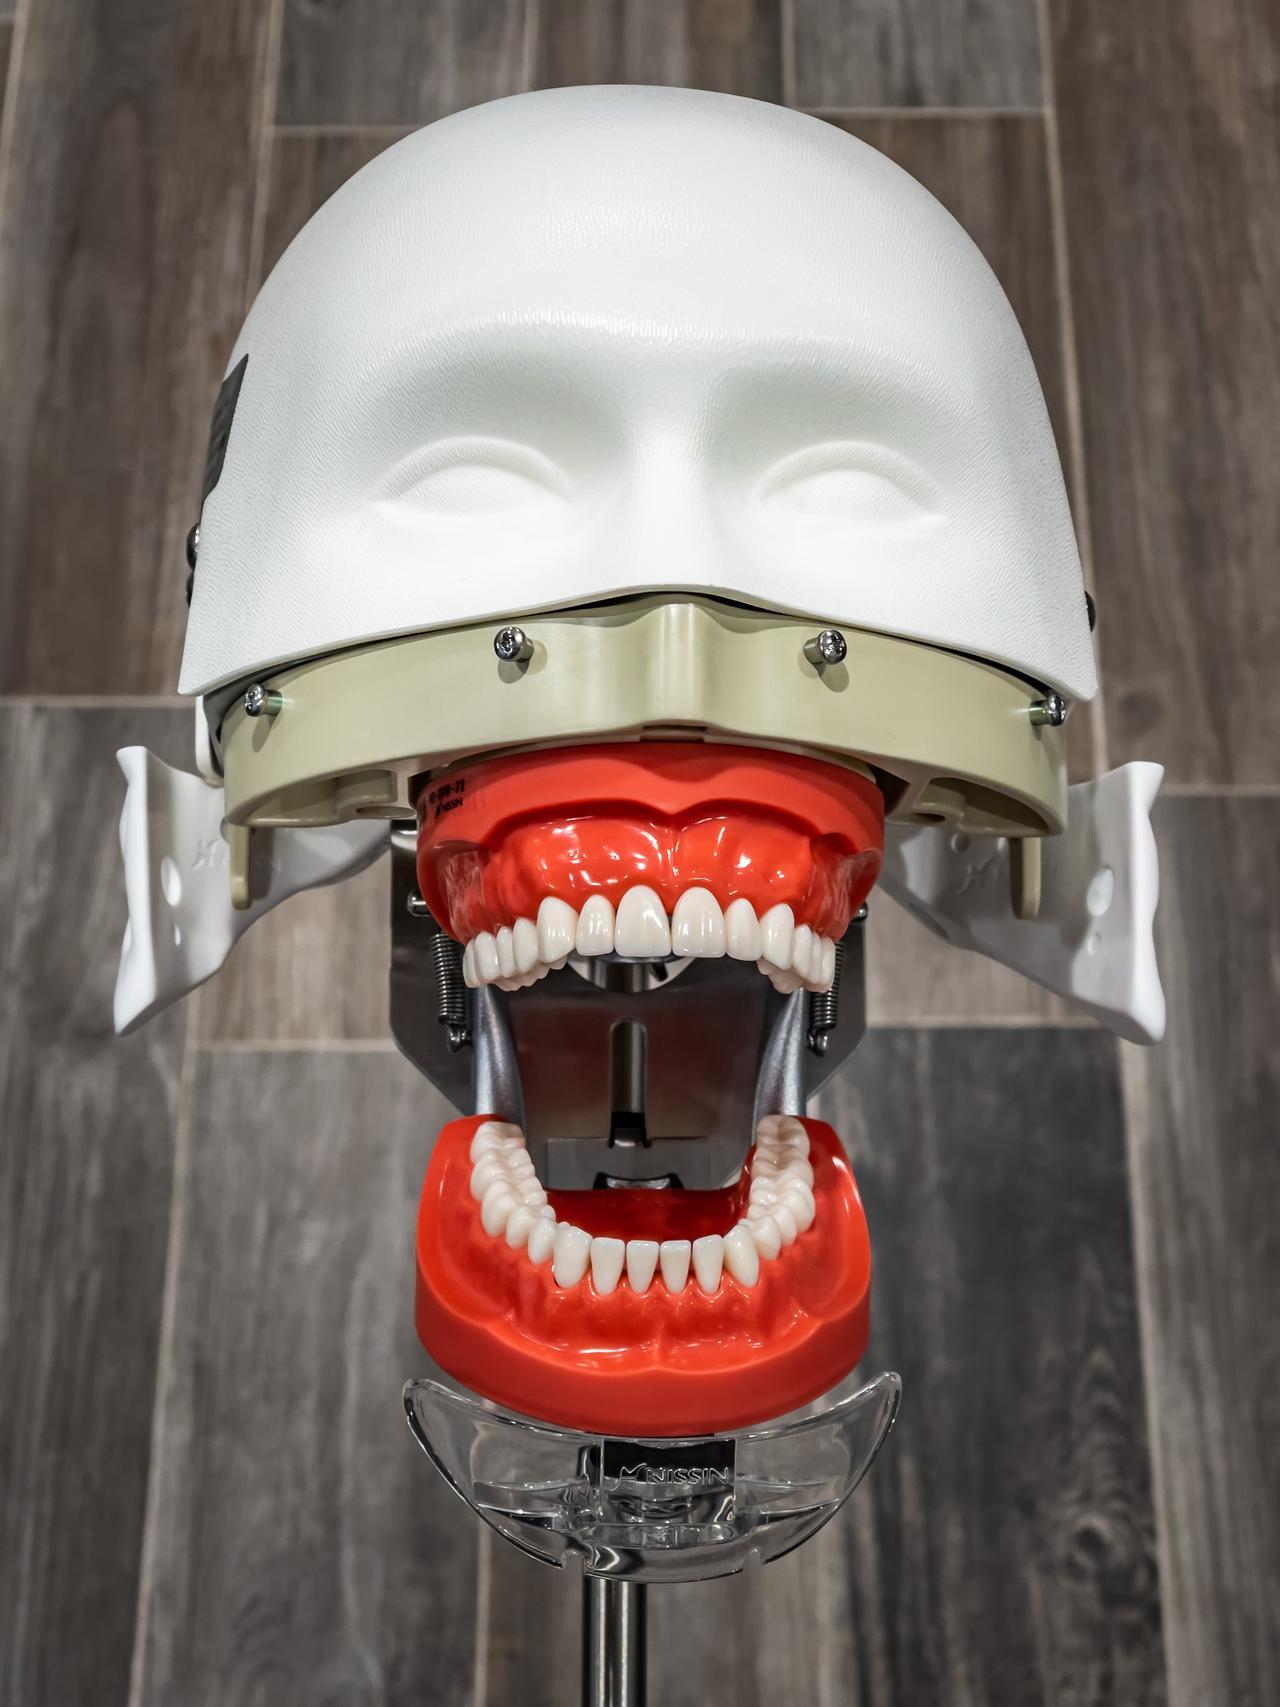 Dentist training tool.